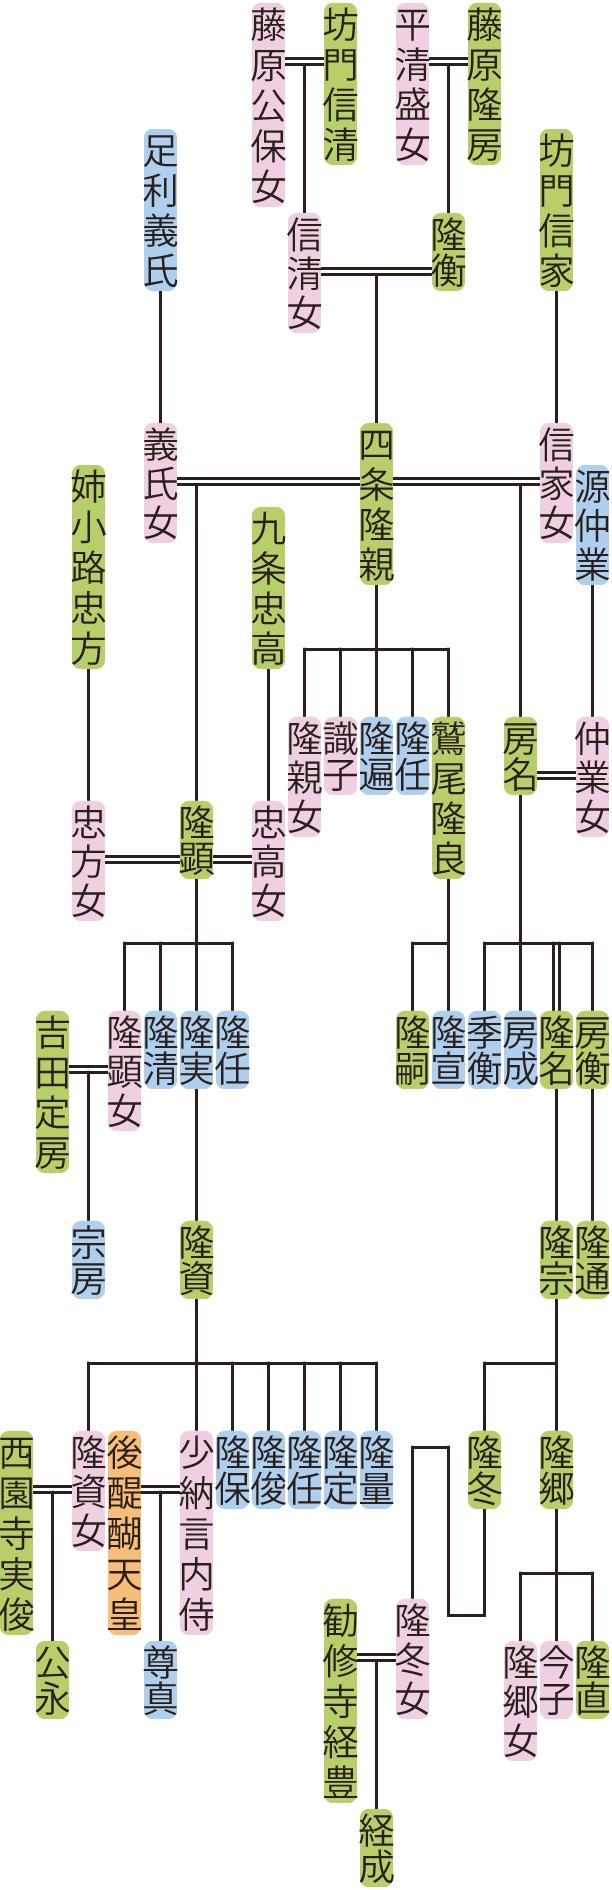 四条隆親~隆宗の系図